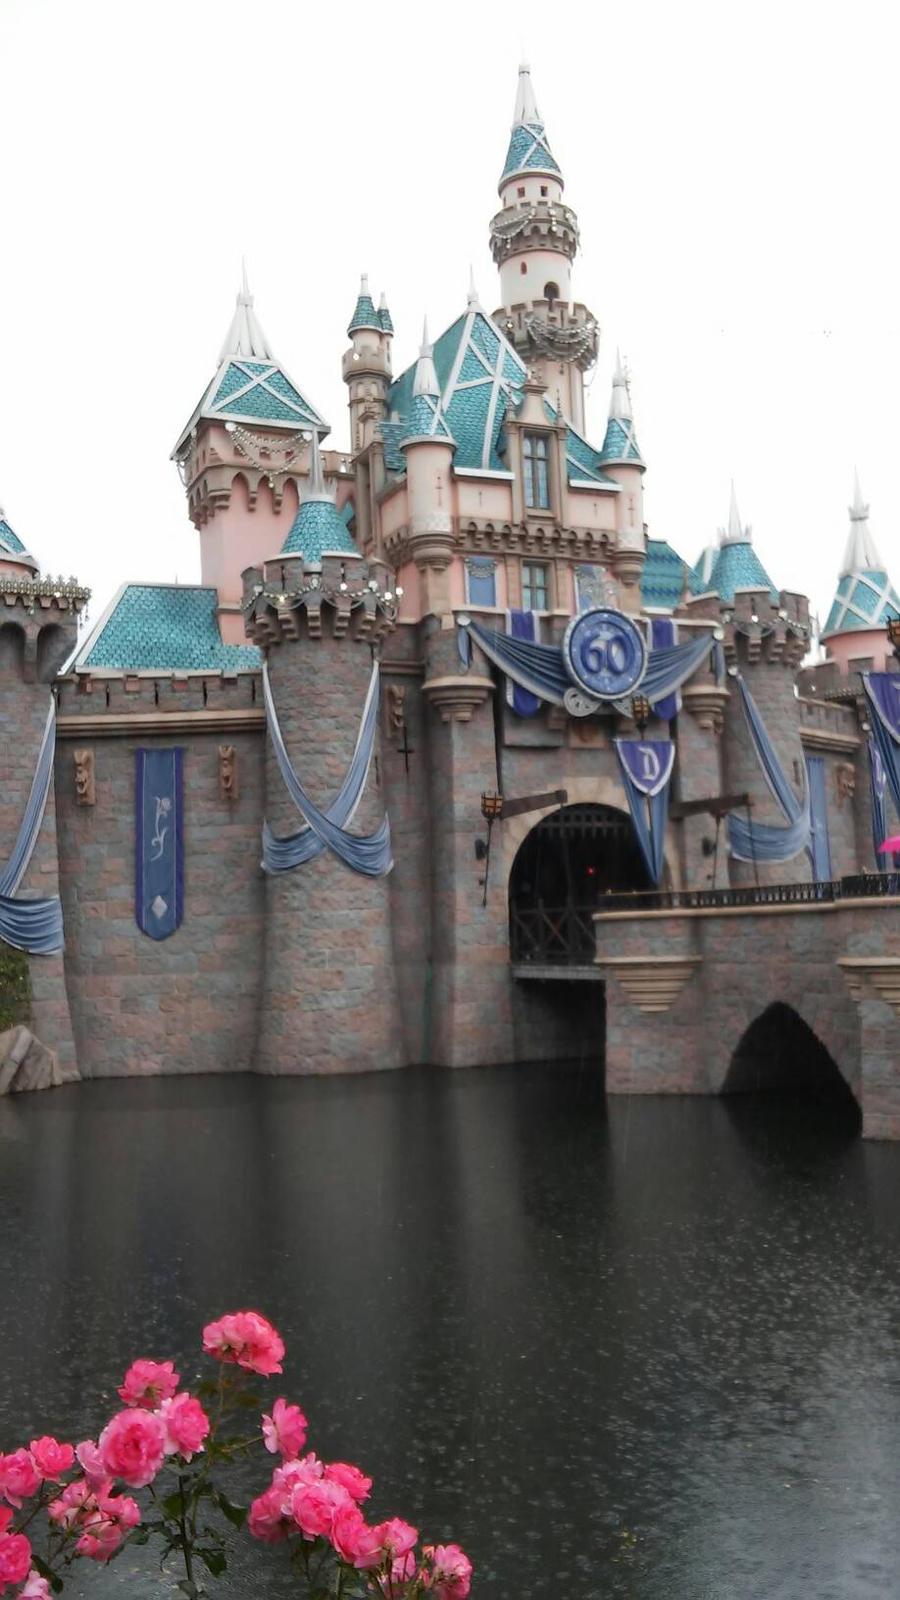 Rainy Disney land by Bella-Who-1